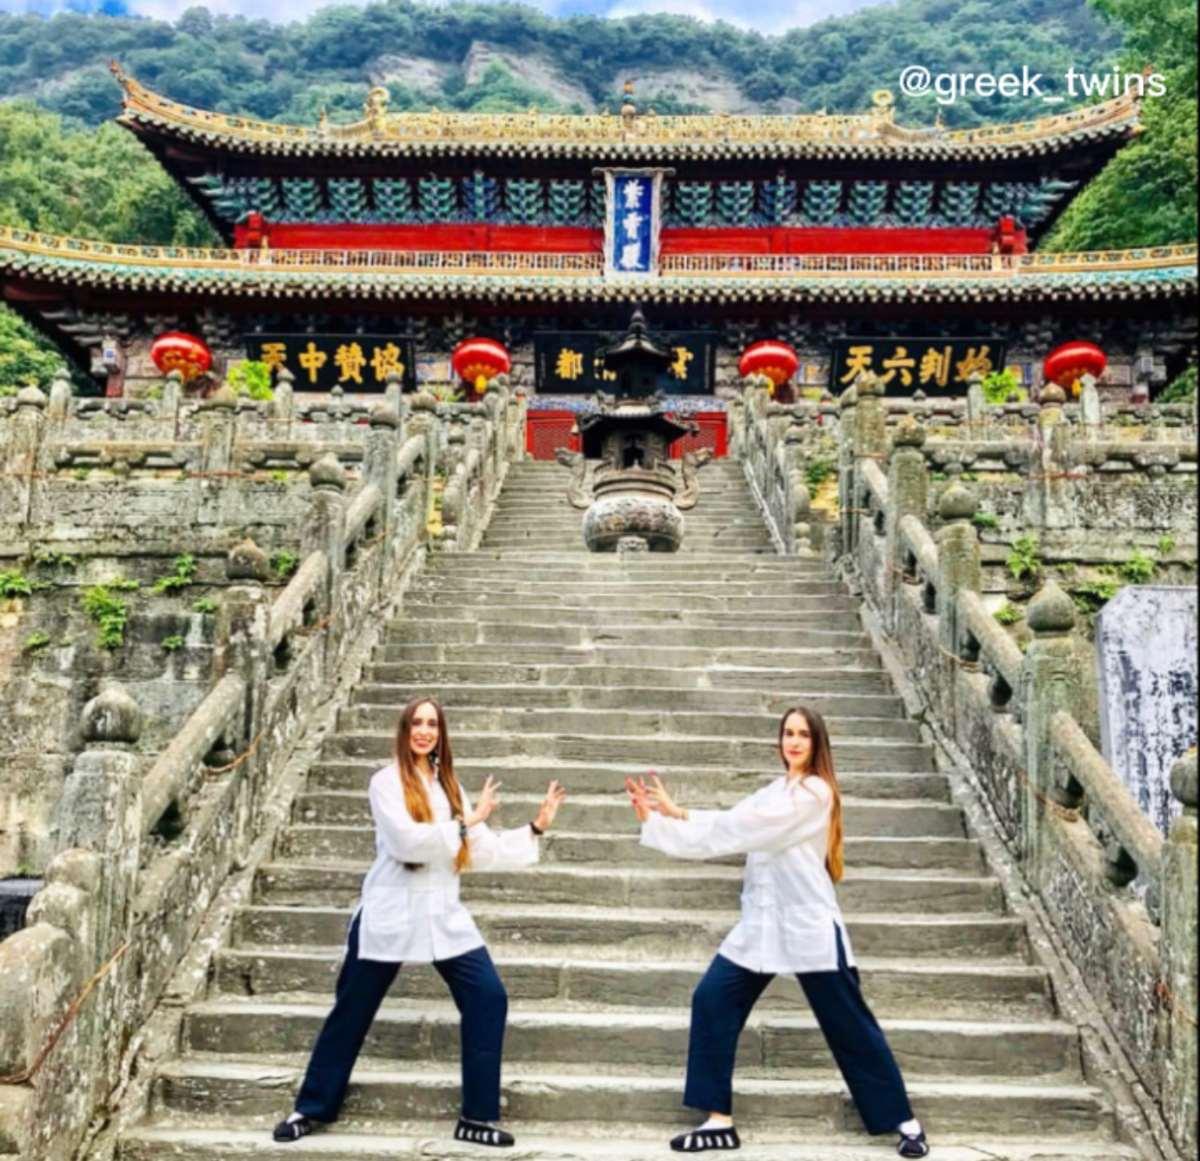 Greek Twins: Γένους θηλυκού είναι η προβολή της Ελλάδας στην μακρινή Κίνα!